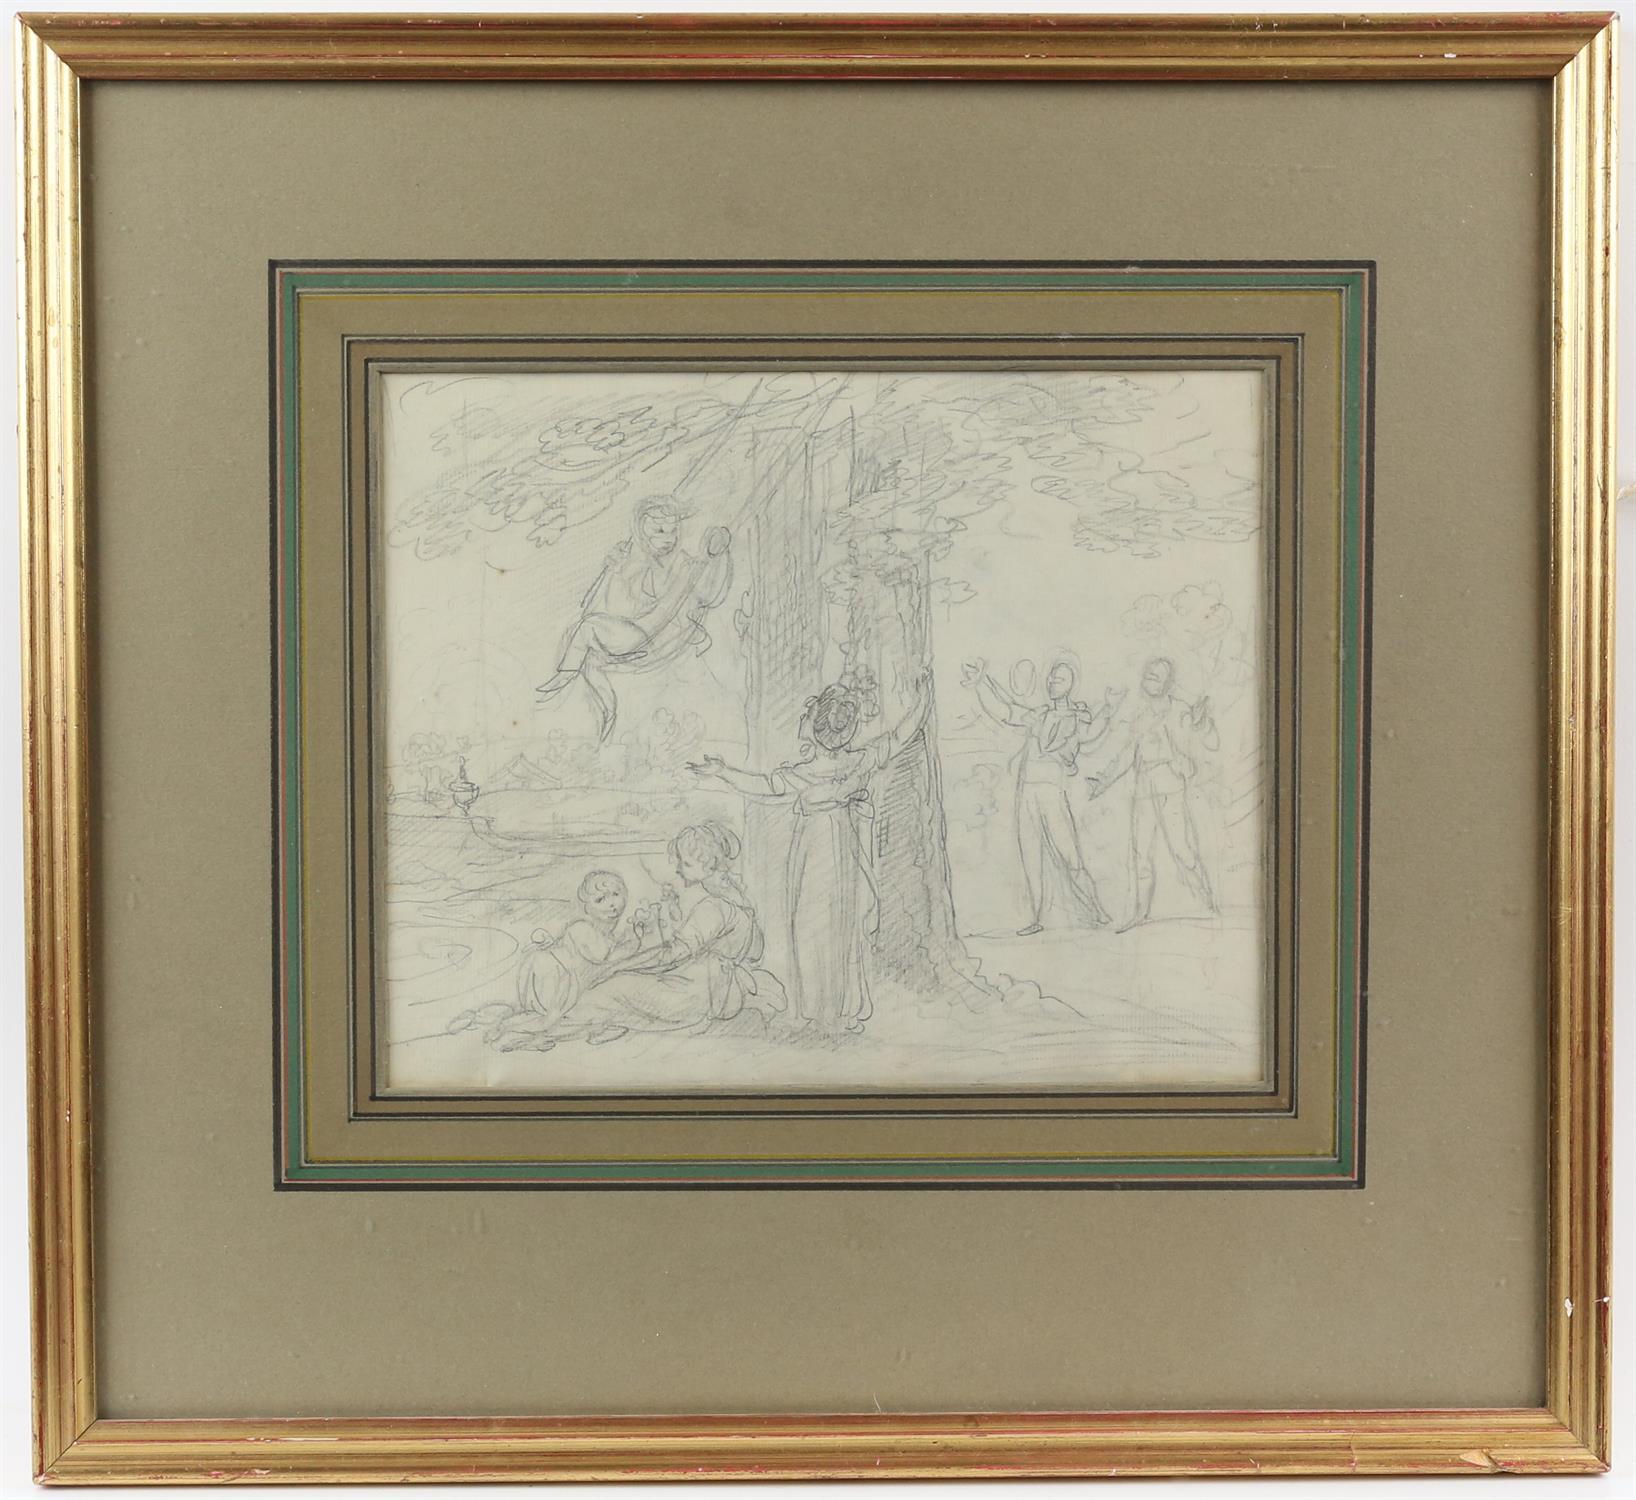 Maria Spilsbury (British, 1777- c. 1823), 'Swinging' pencil drawing, 18cm x 22.5cm, - Image 2 of 3